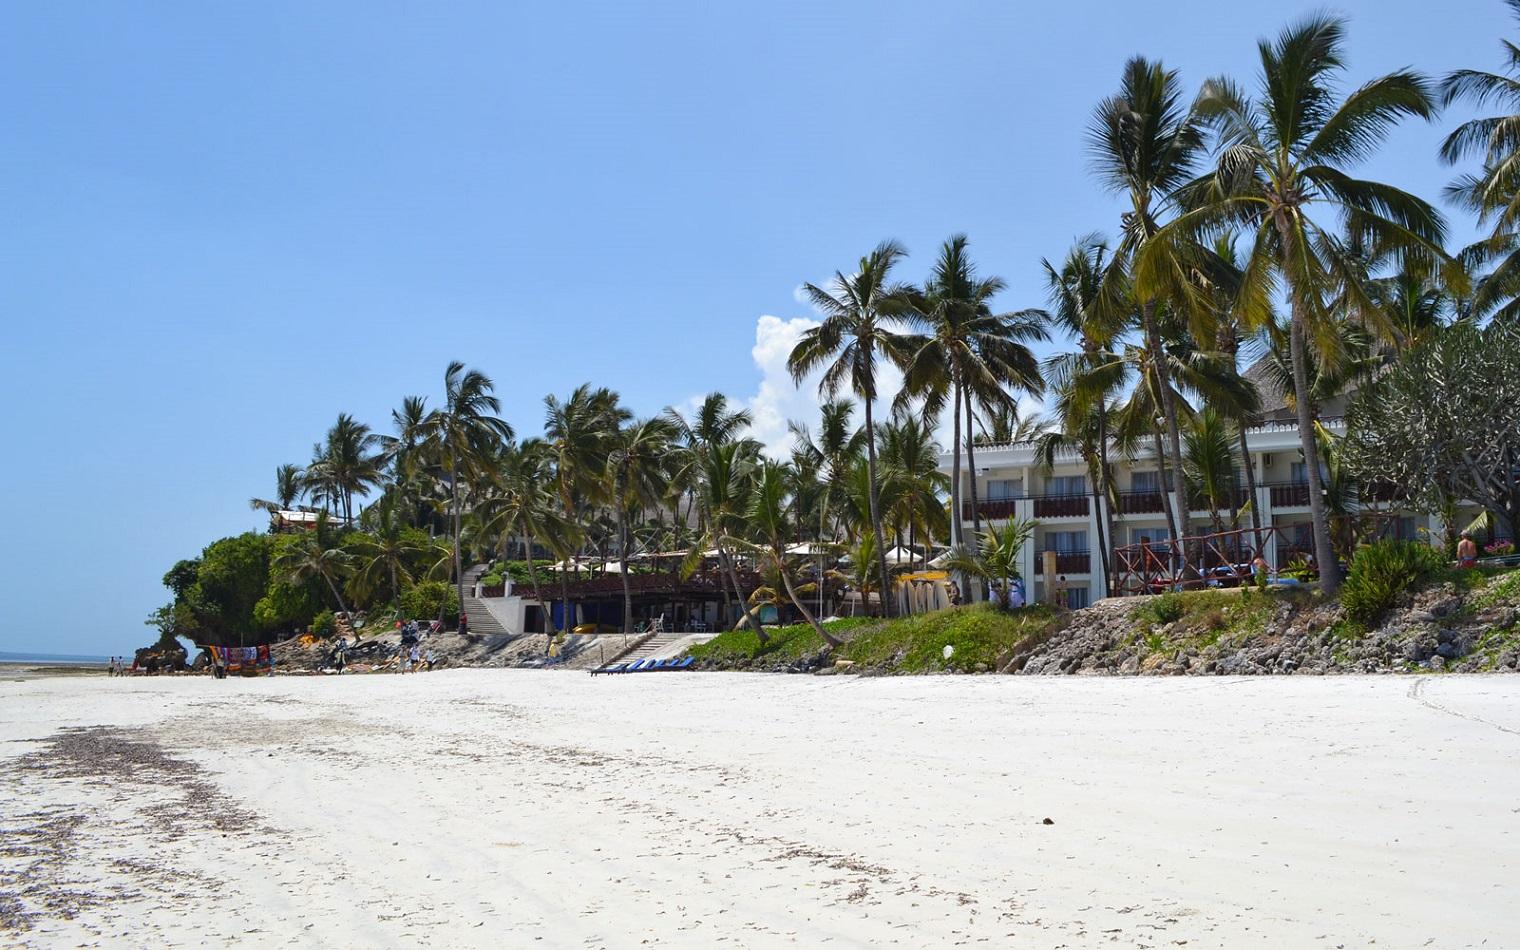 mombasa beach hotel tourism